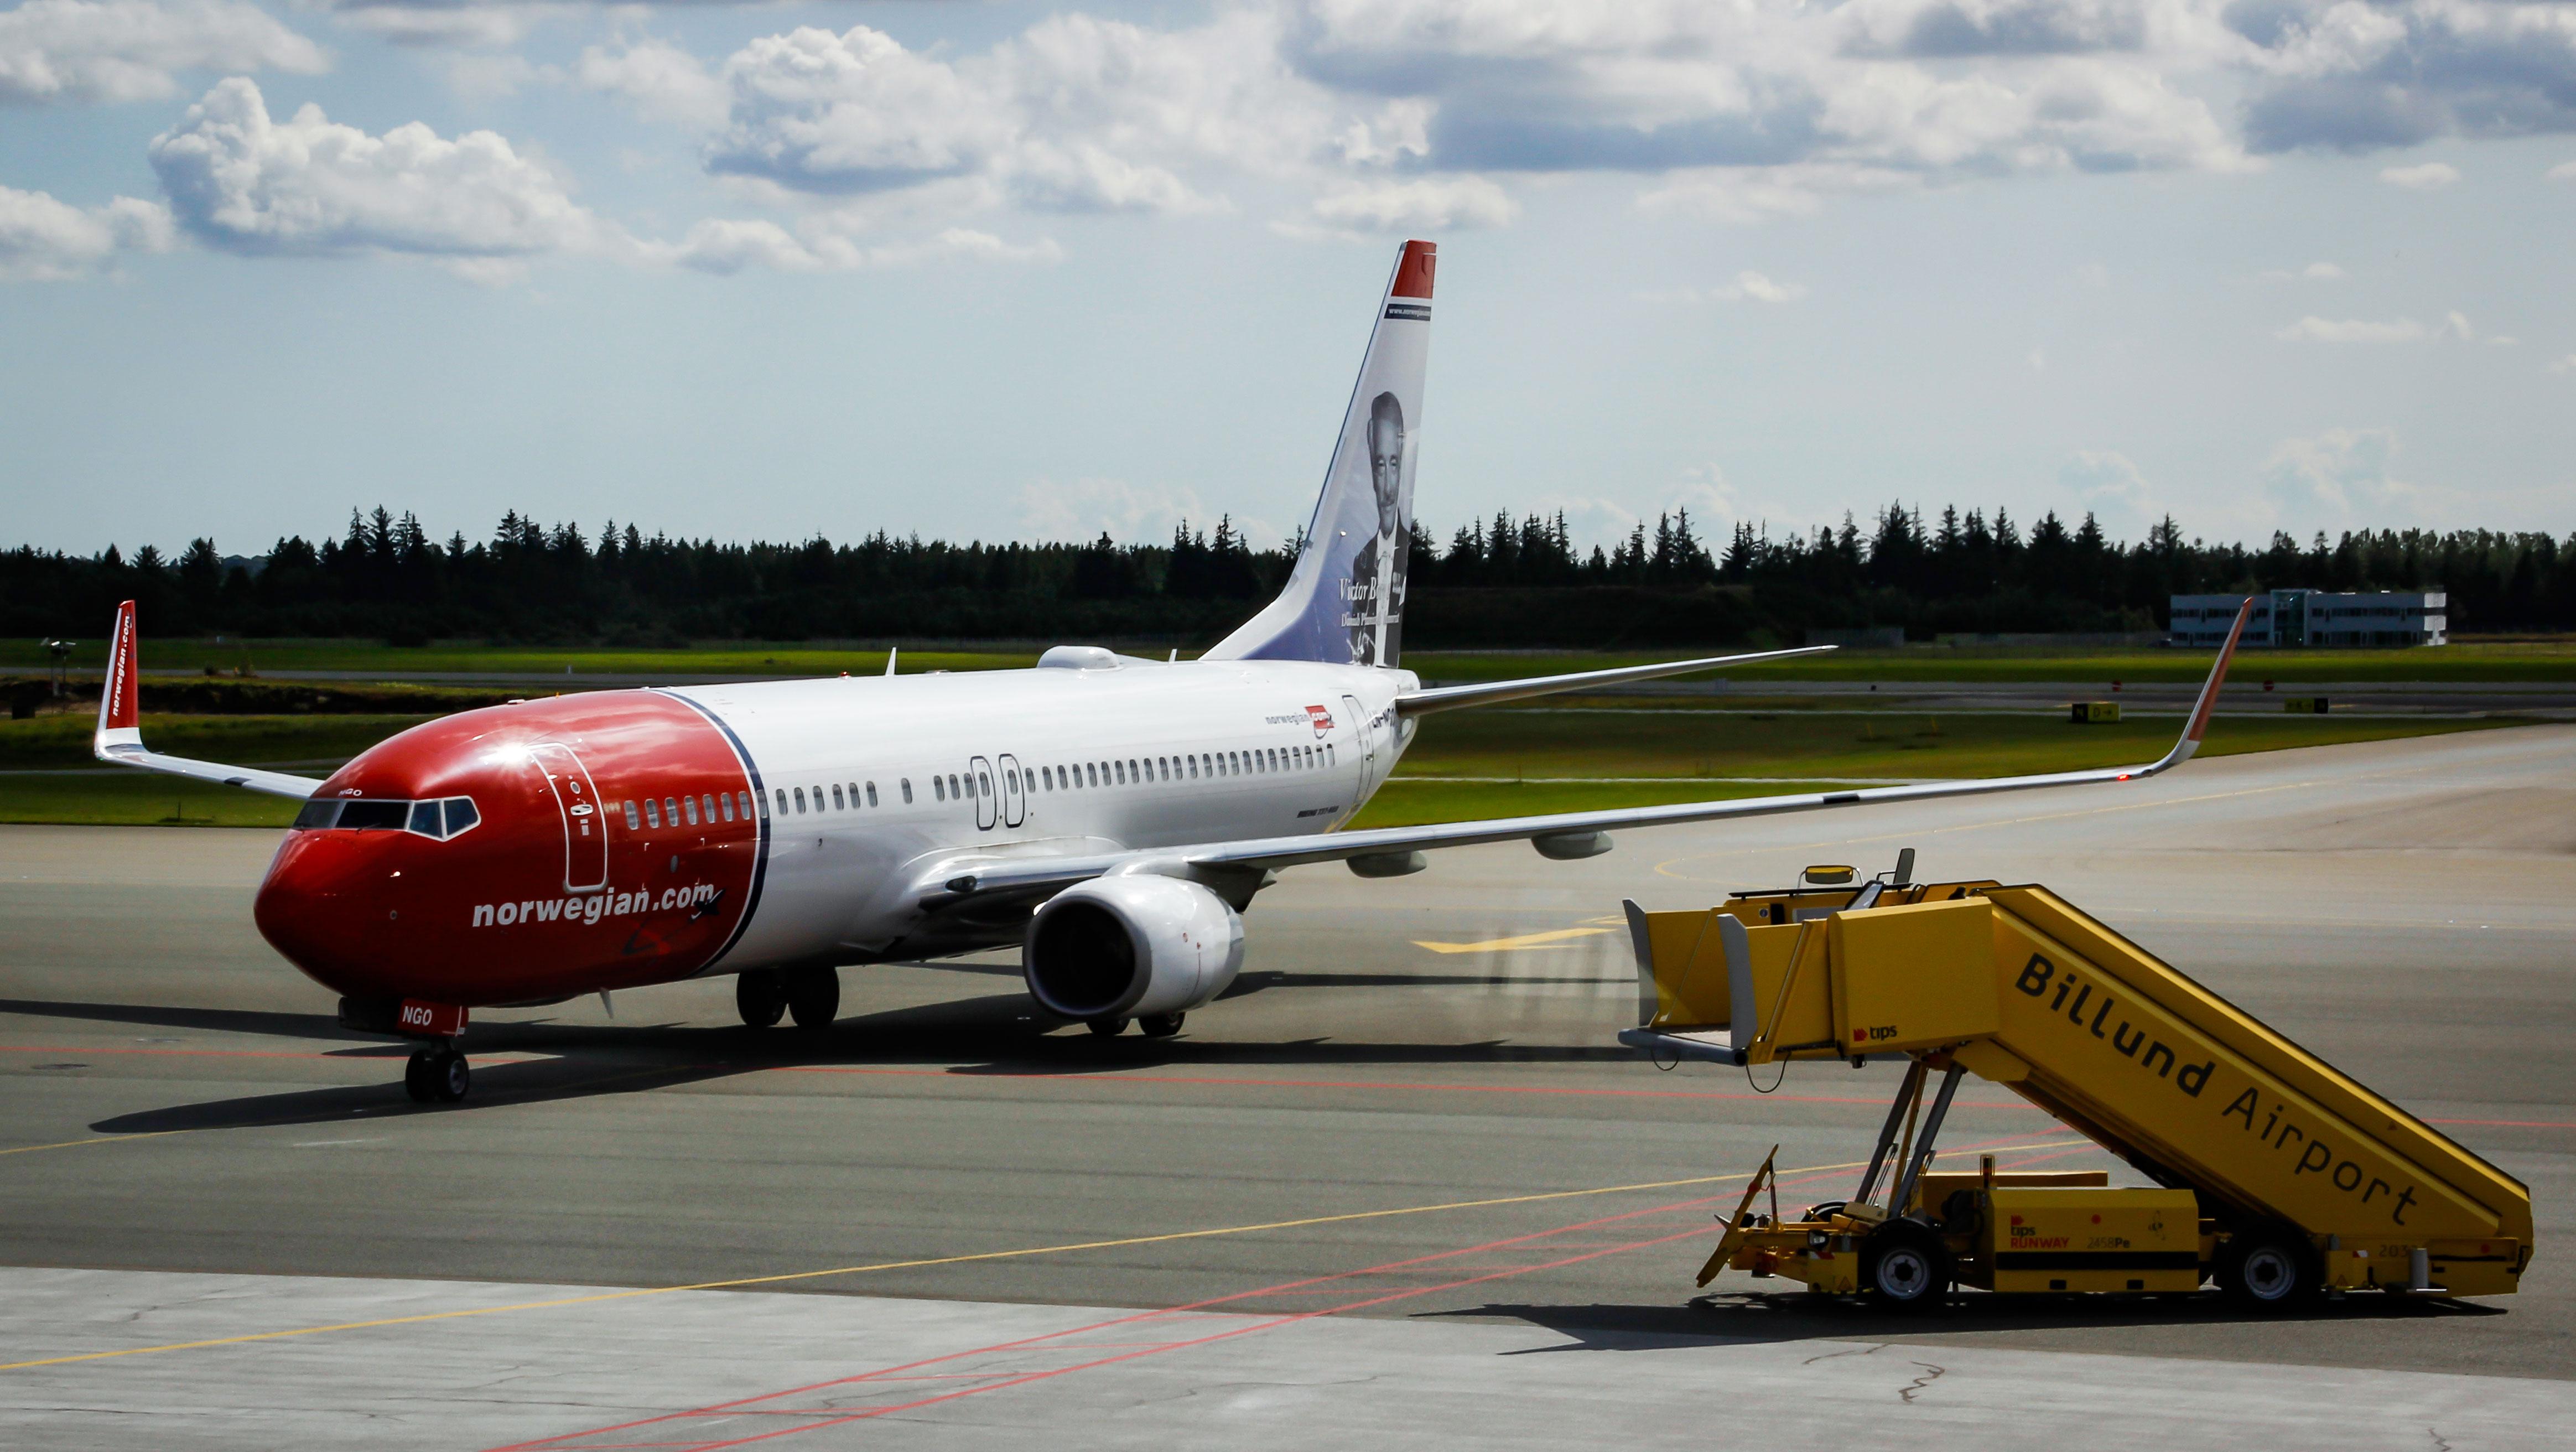 Norwegian-fly i Billund Lufthavn. (Foto: Henrik Meisel, BLL)